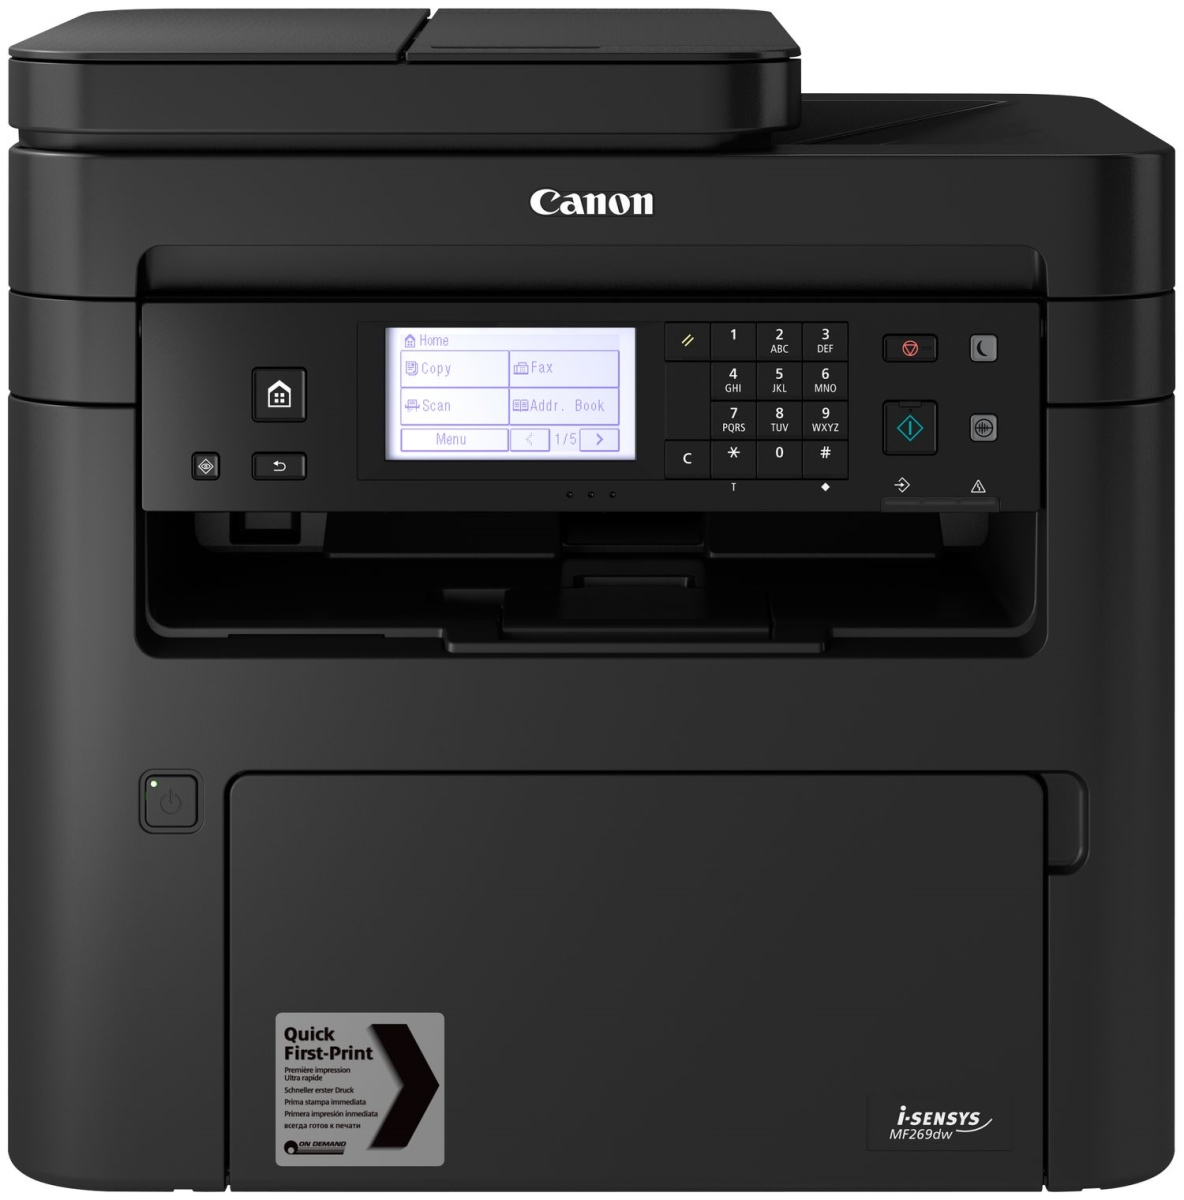 Лазерное МФУ Canon iSENSYS MF269dw i-SENSYS MF269dw